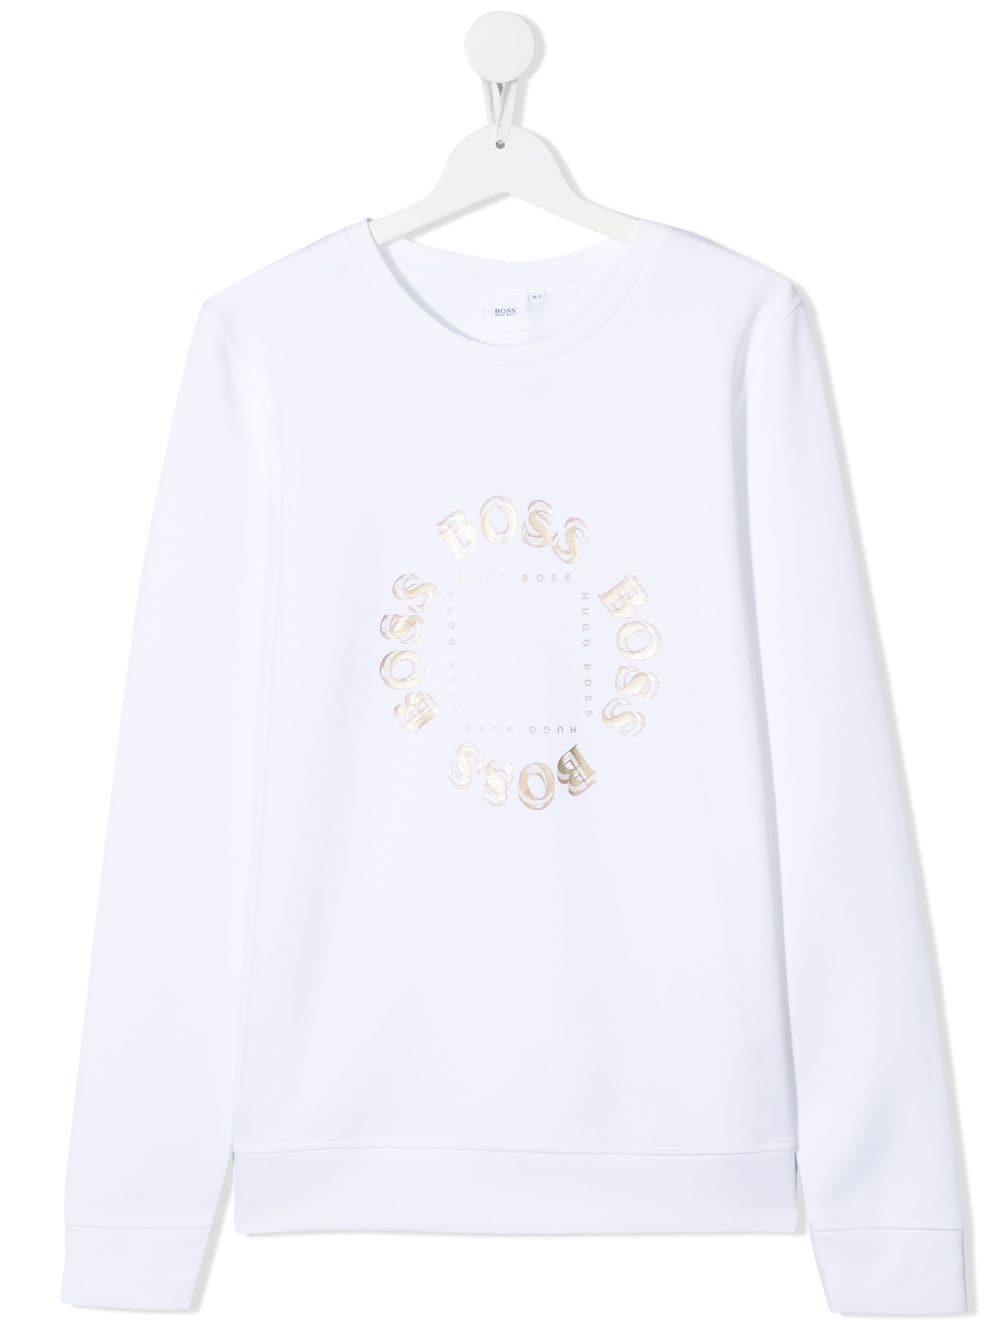 HUGO BOSS | Sweatshirt | J25L3910BT